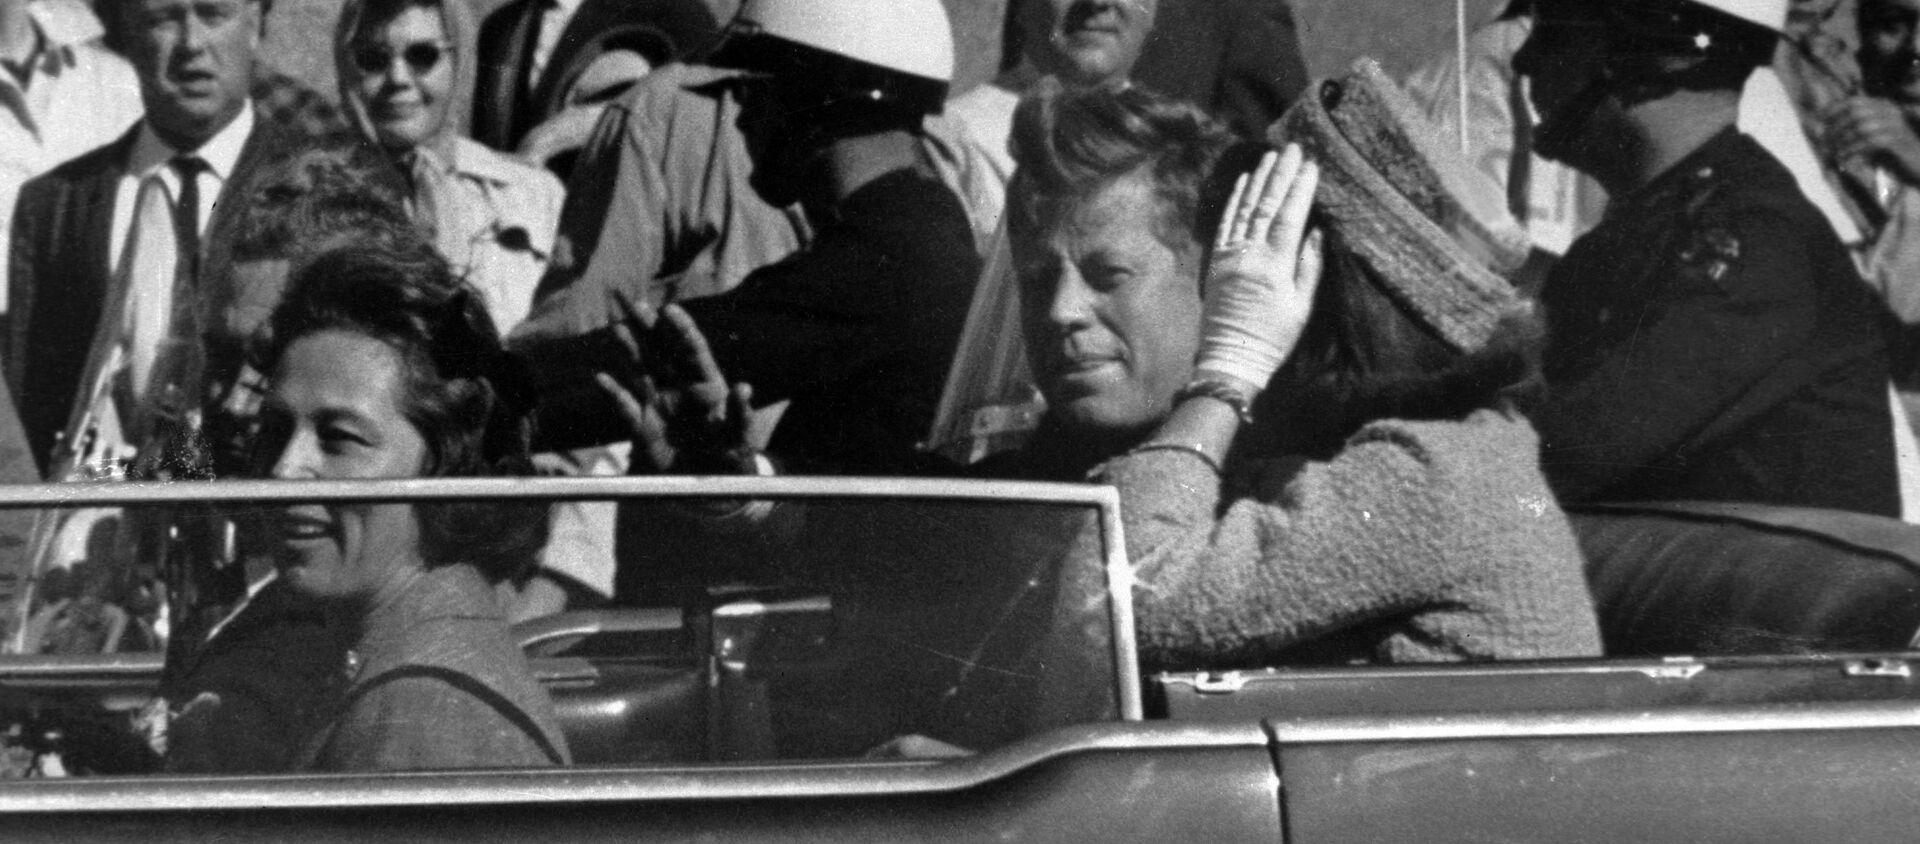 El presidente de EEUU, John F. Kennedy, un minuto antes de ser asesinado - Sputnik Mundo, 1920, 22.11.2020